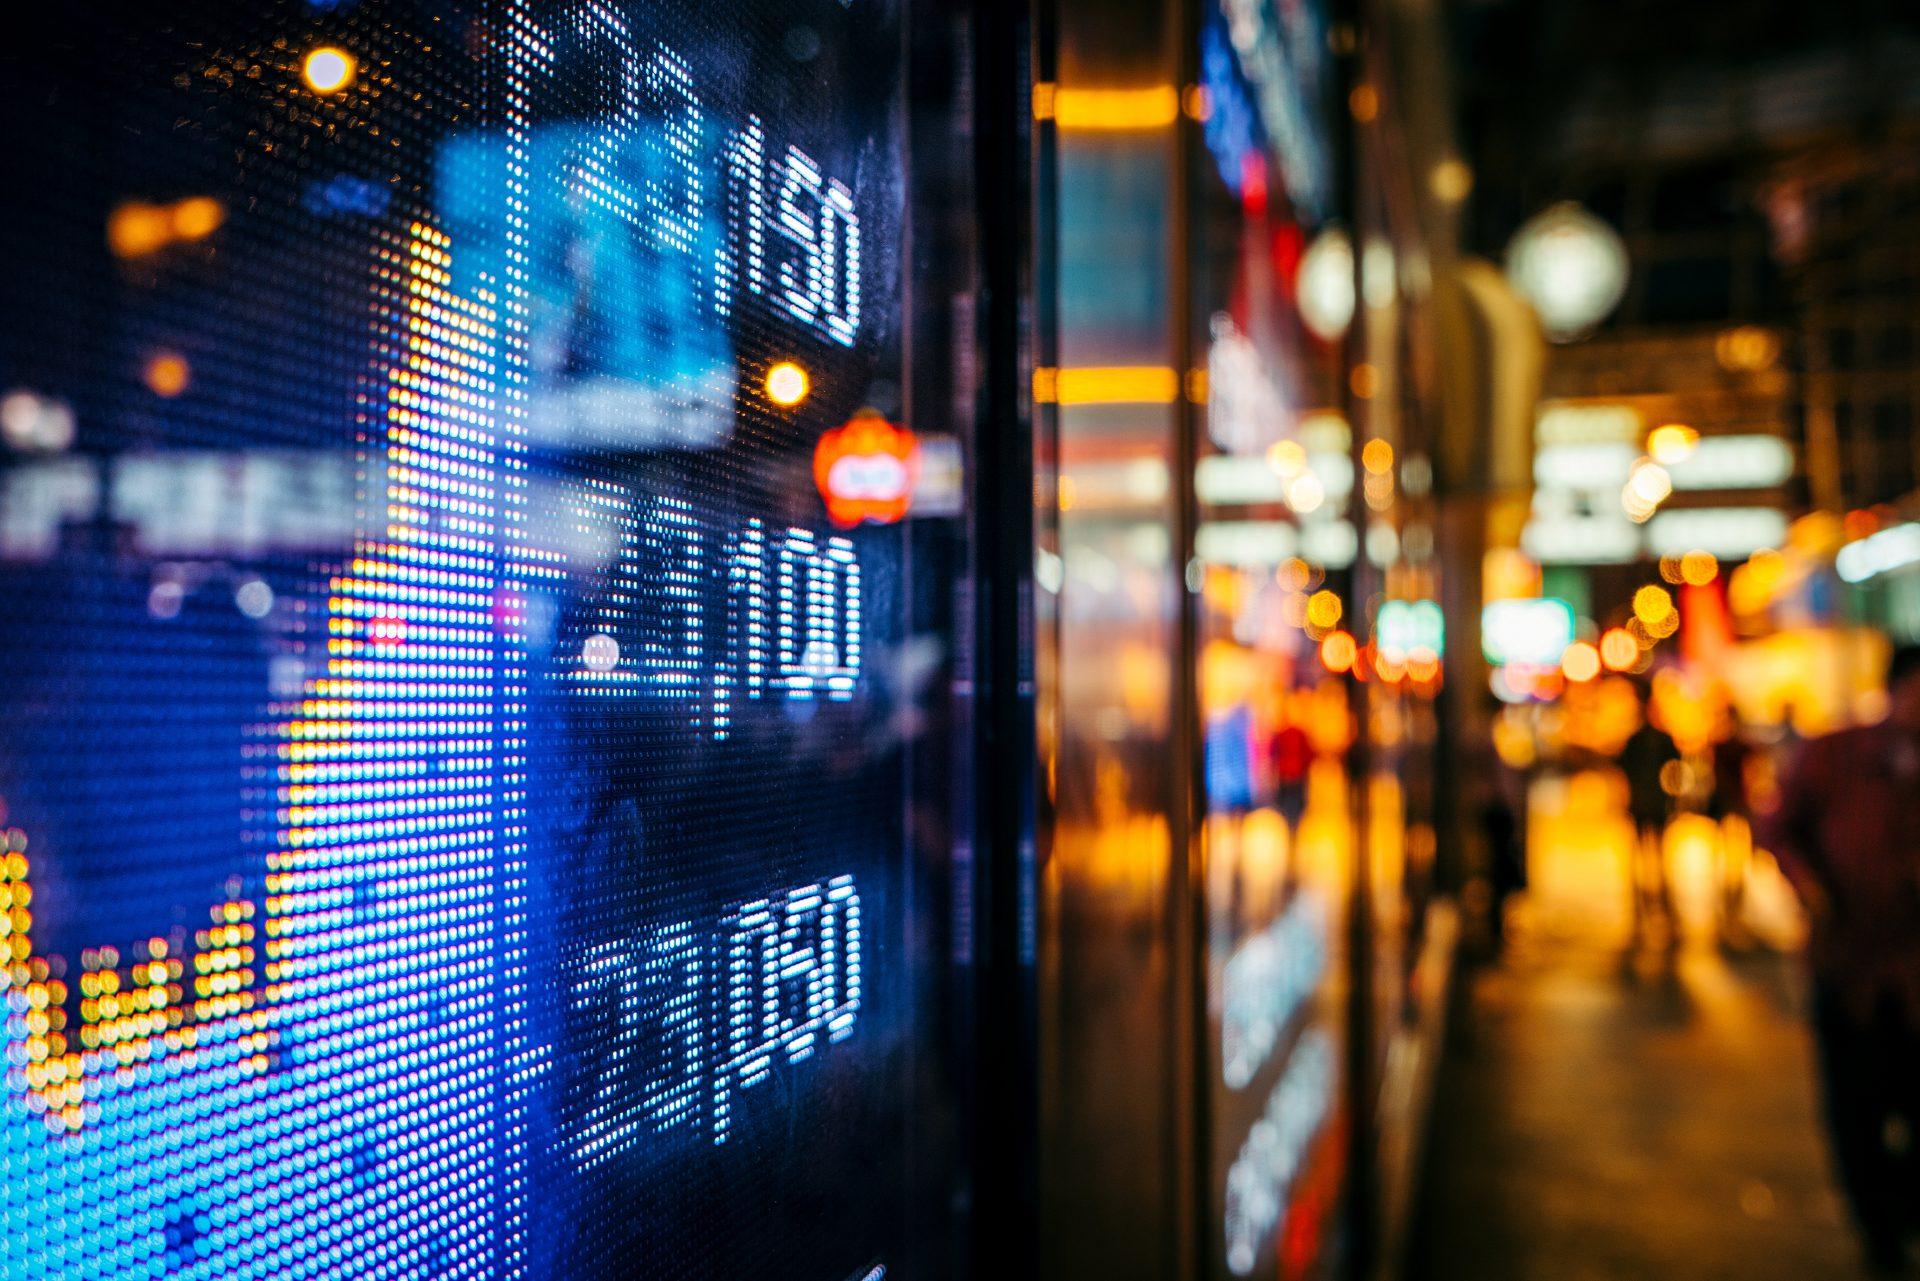 Screen with finance statistics